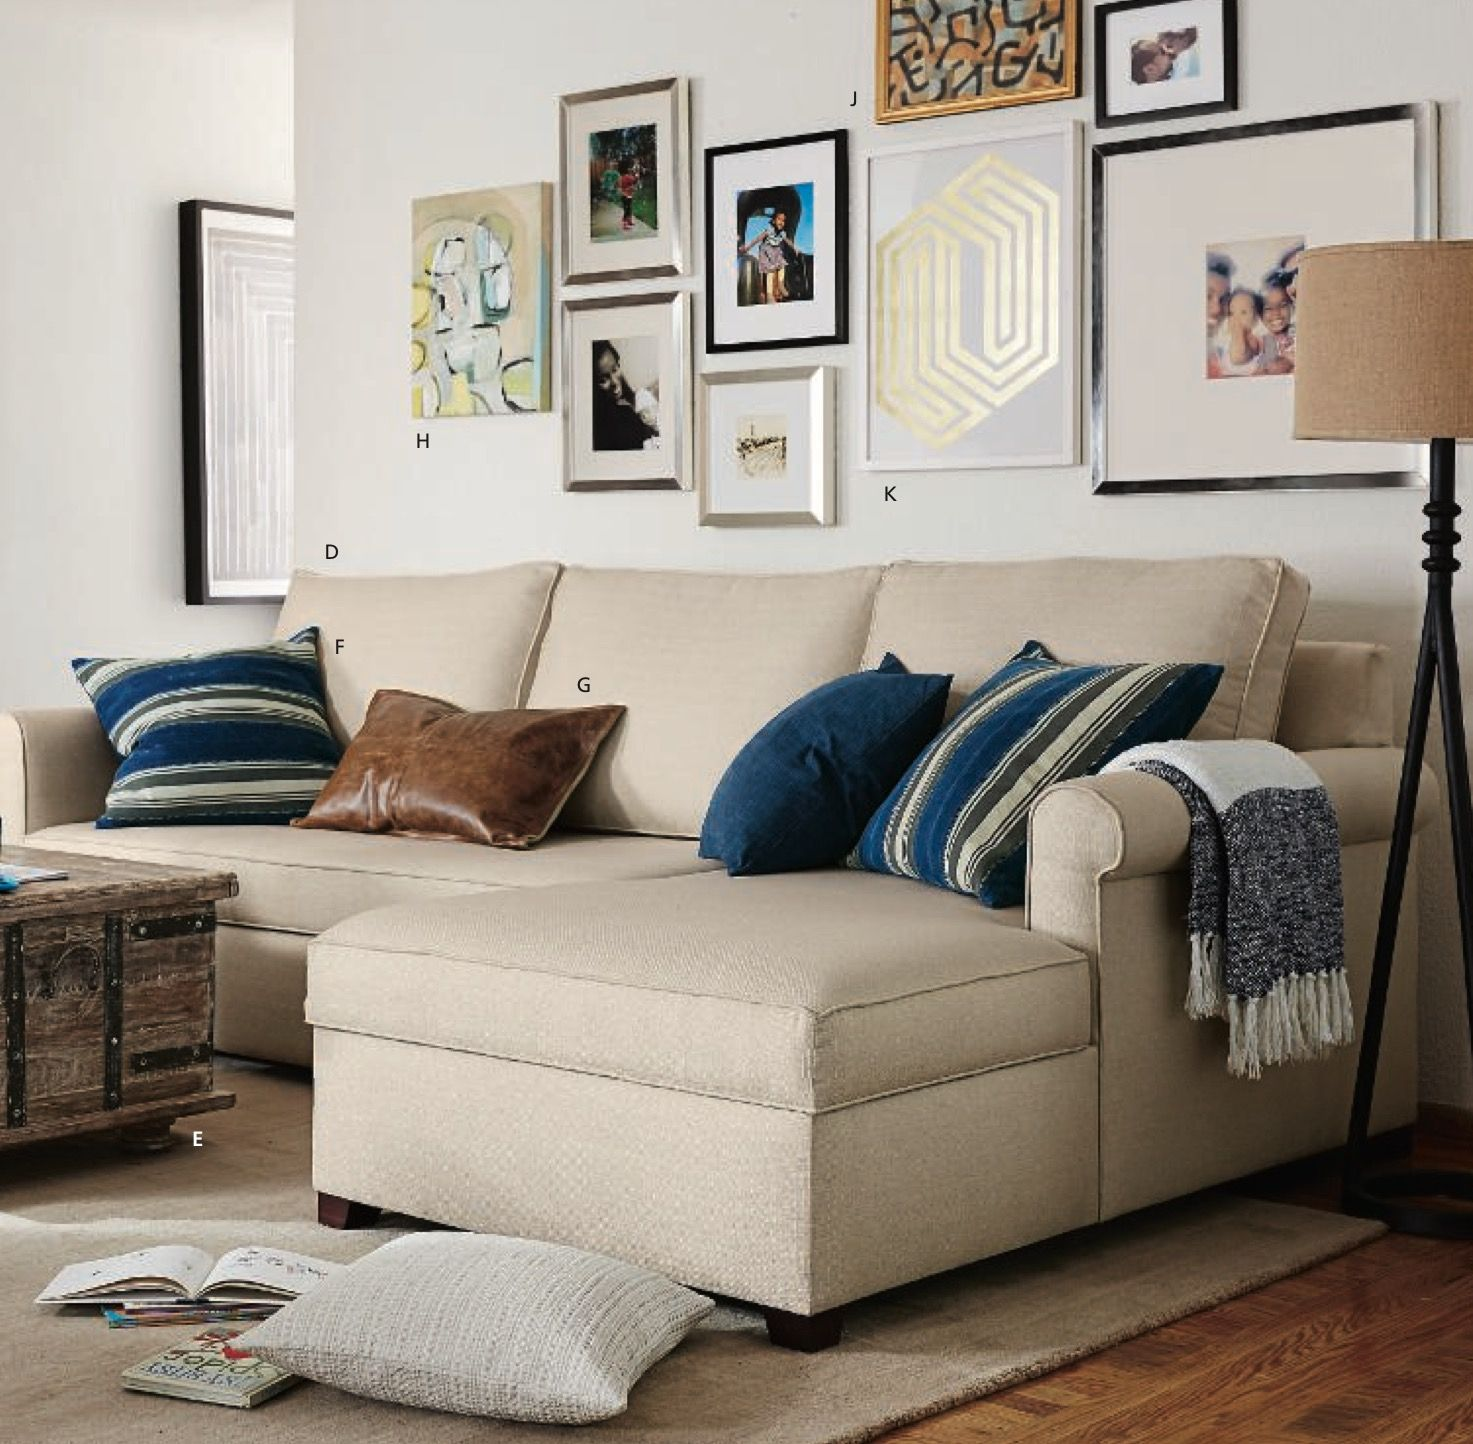 Cameron sofa with roll arms shown in Basketweave Slub Oatmeal